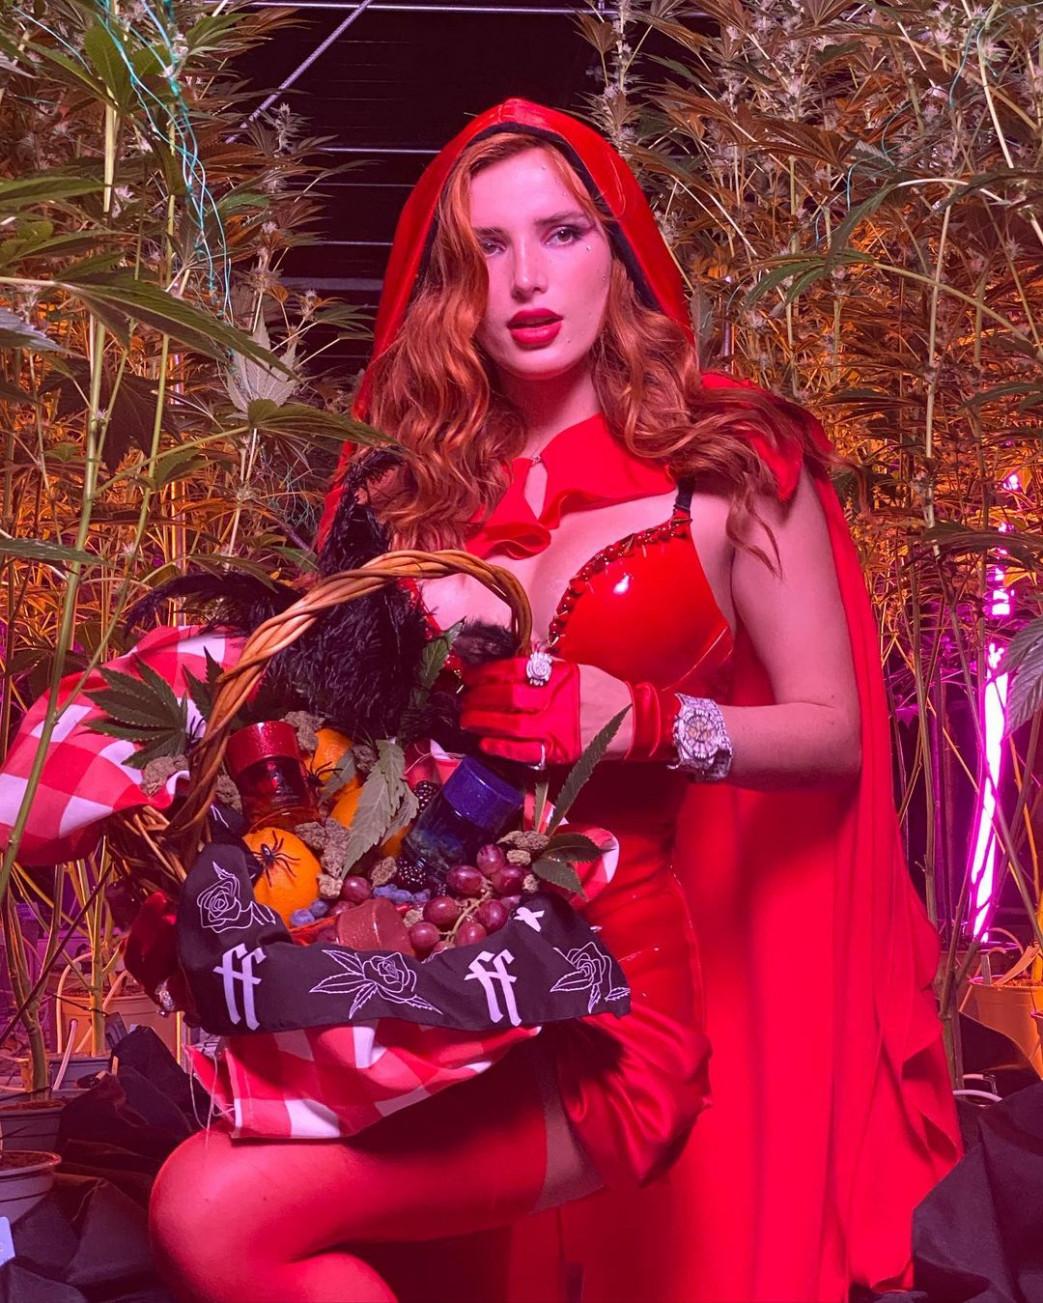 Bella-Thorne-In-Busty-Halloween-Costume-5.jpg